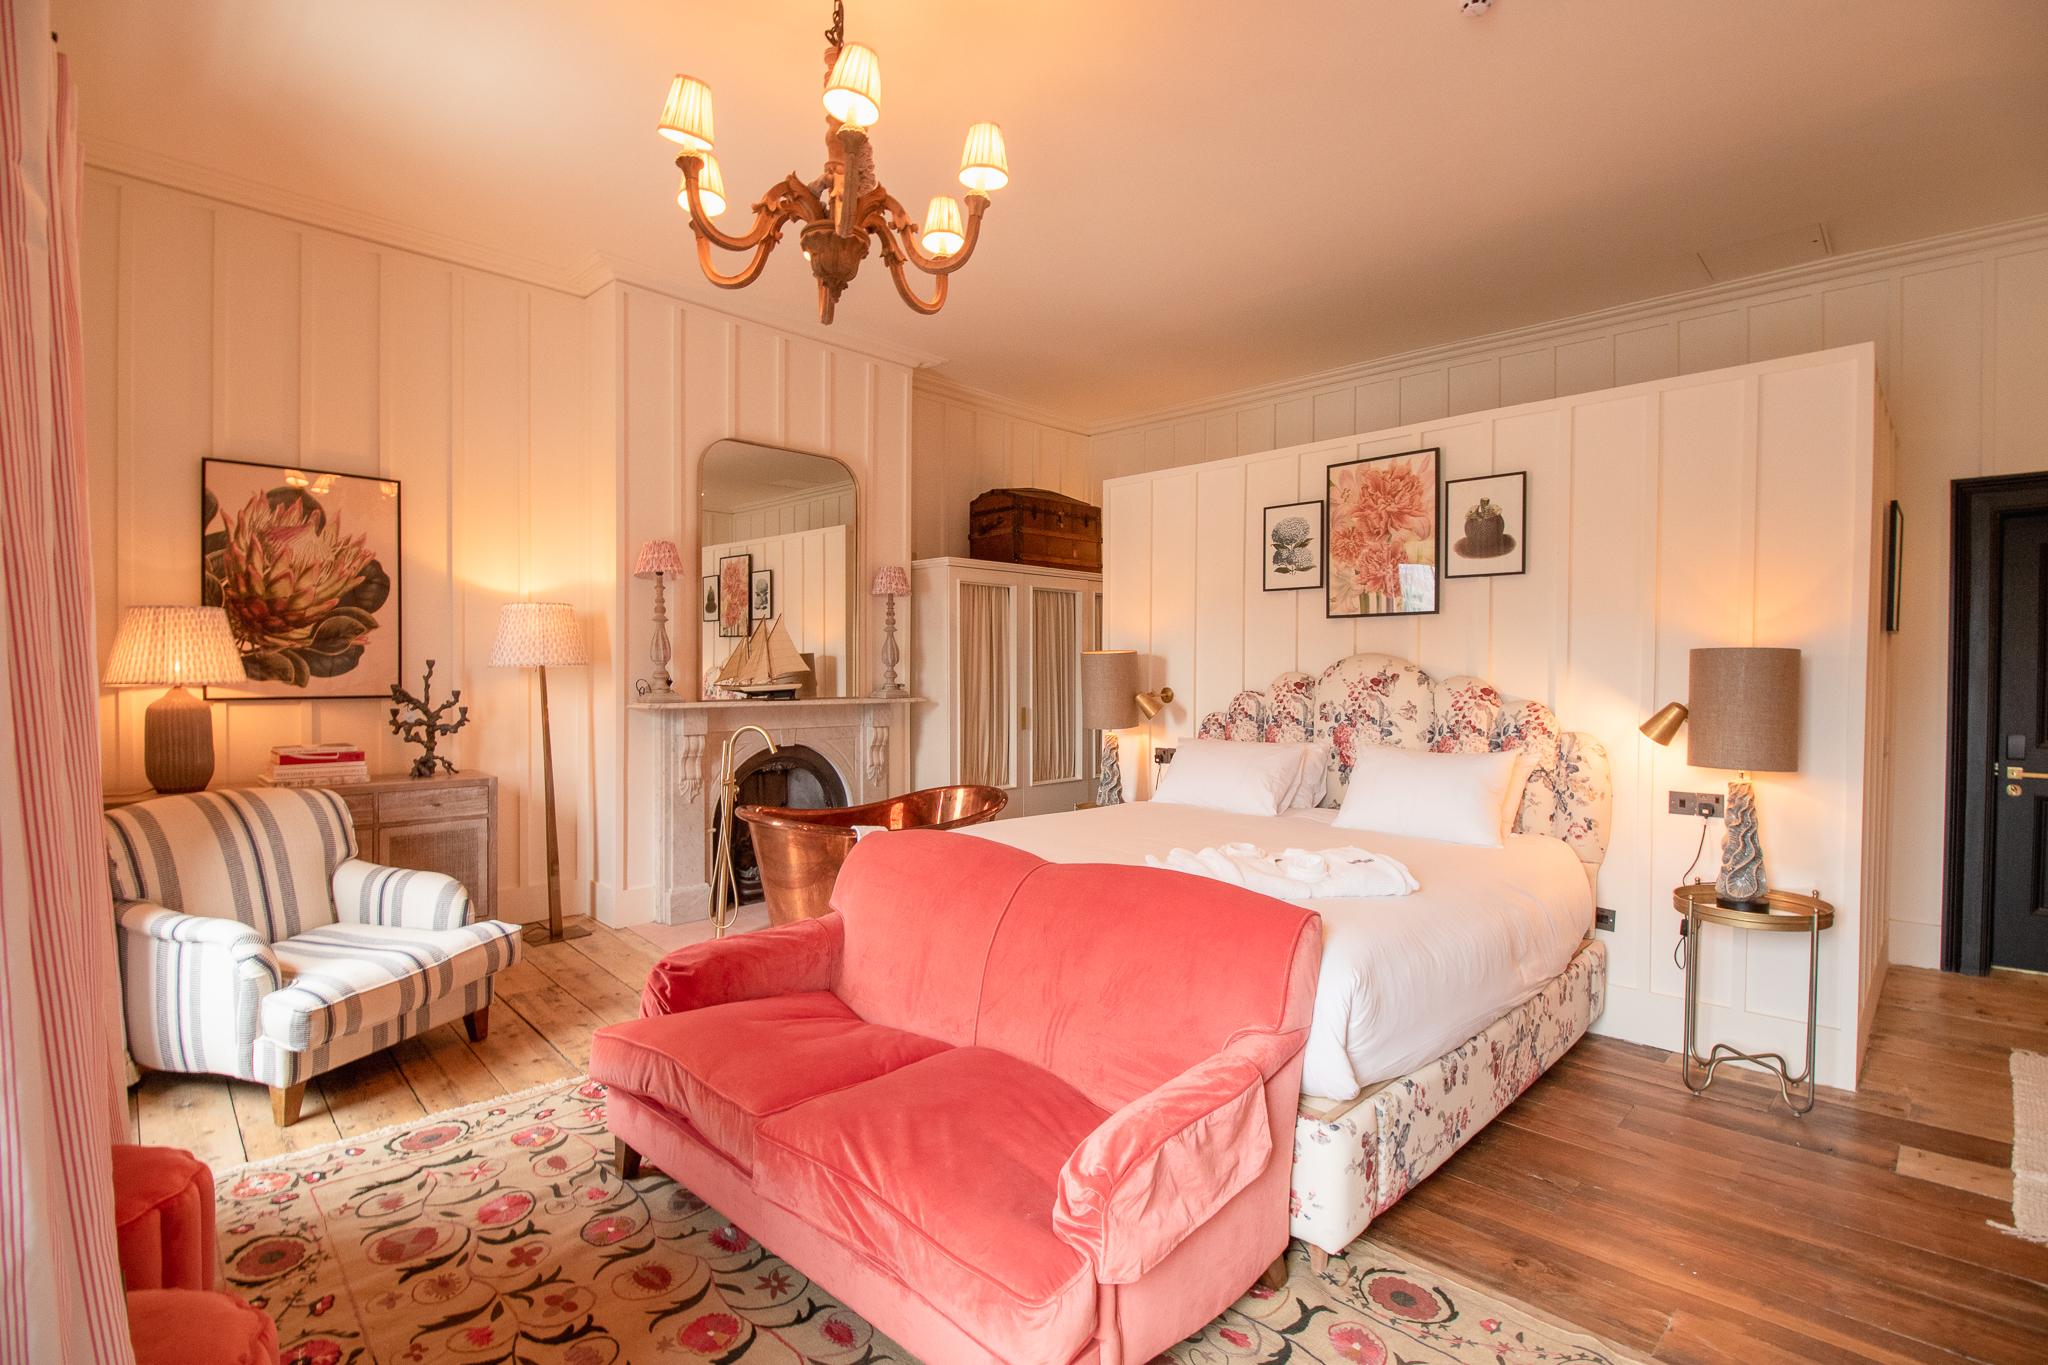 Townhouse Suite, Romantic Breaks Dublin, Romantic Getaways